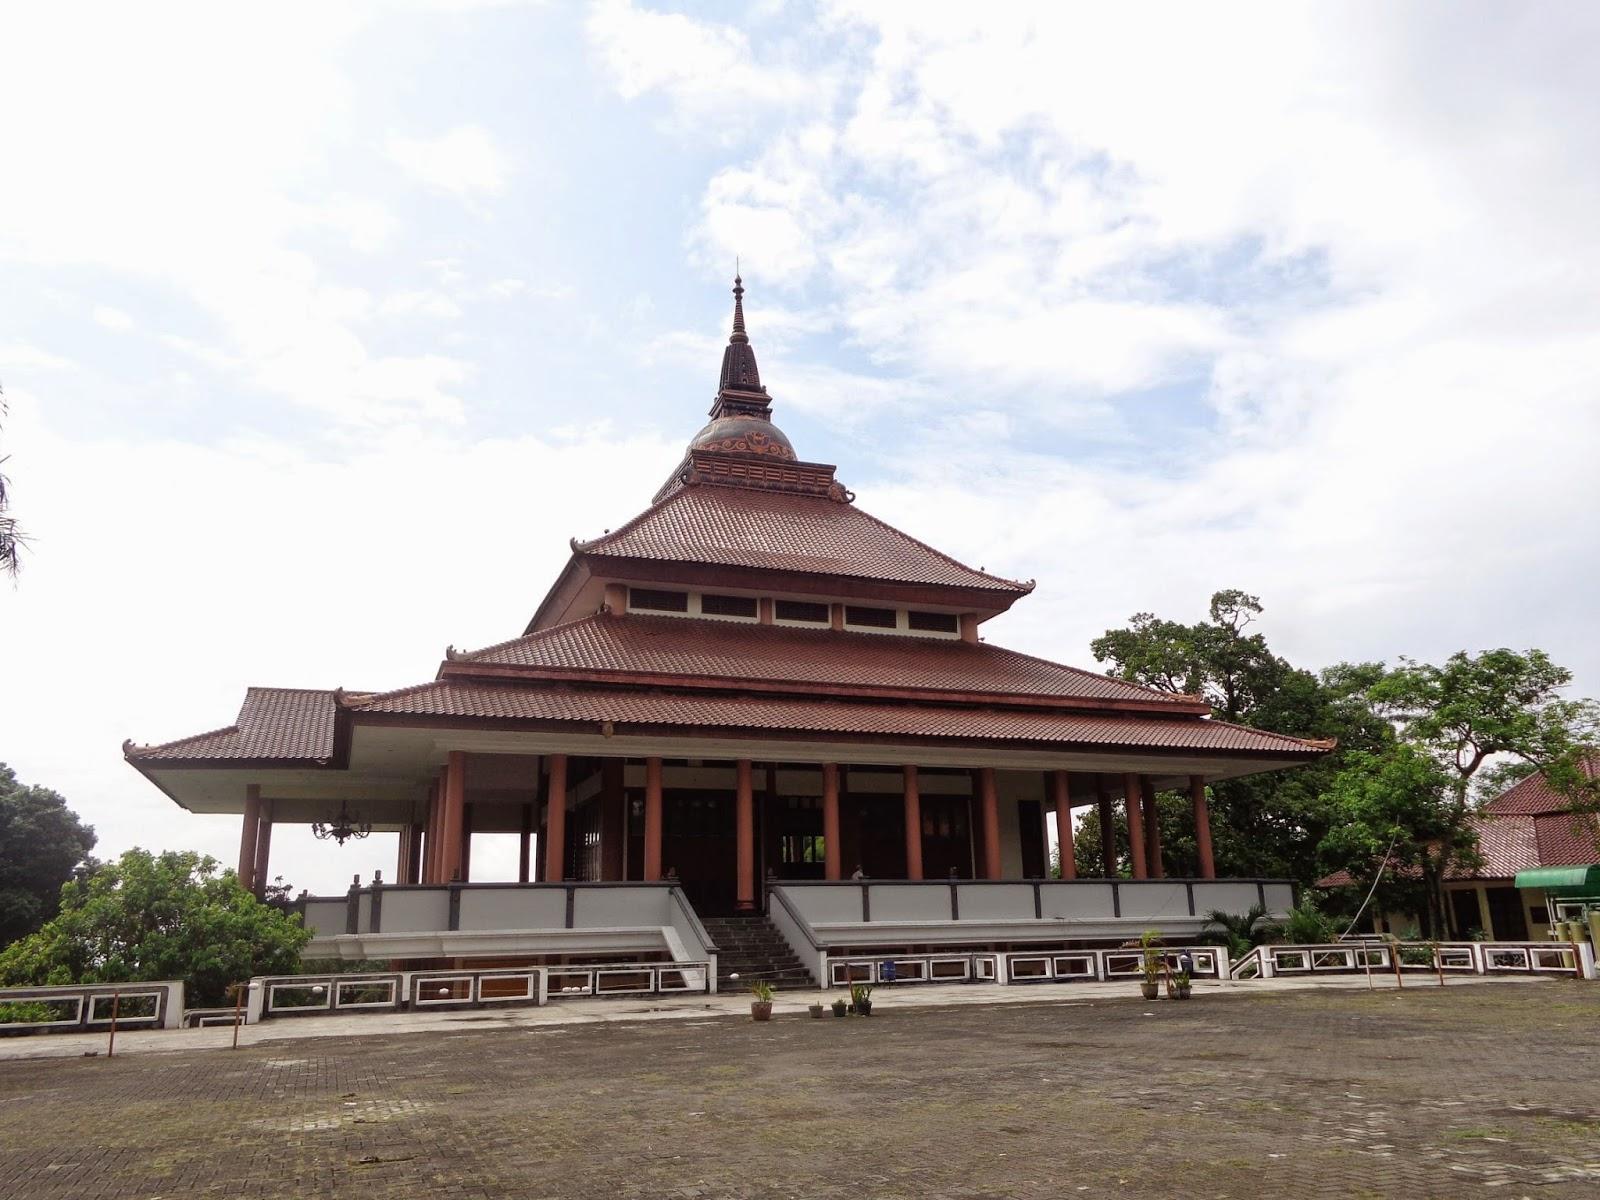 Wisata Religi Pagoda Budhagaya Kota Semarang Jawa Tengah Vihara Dhammasala